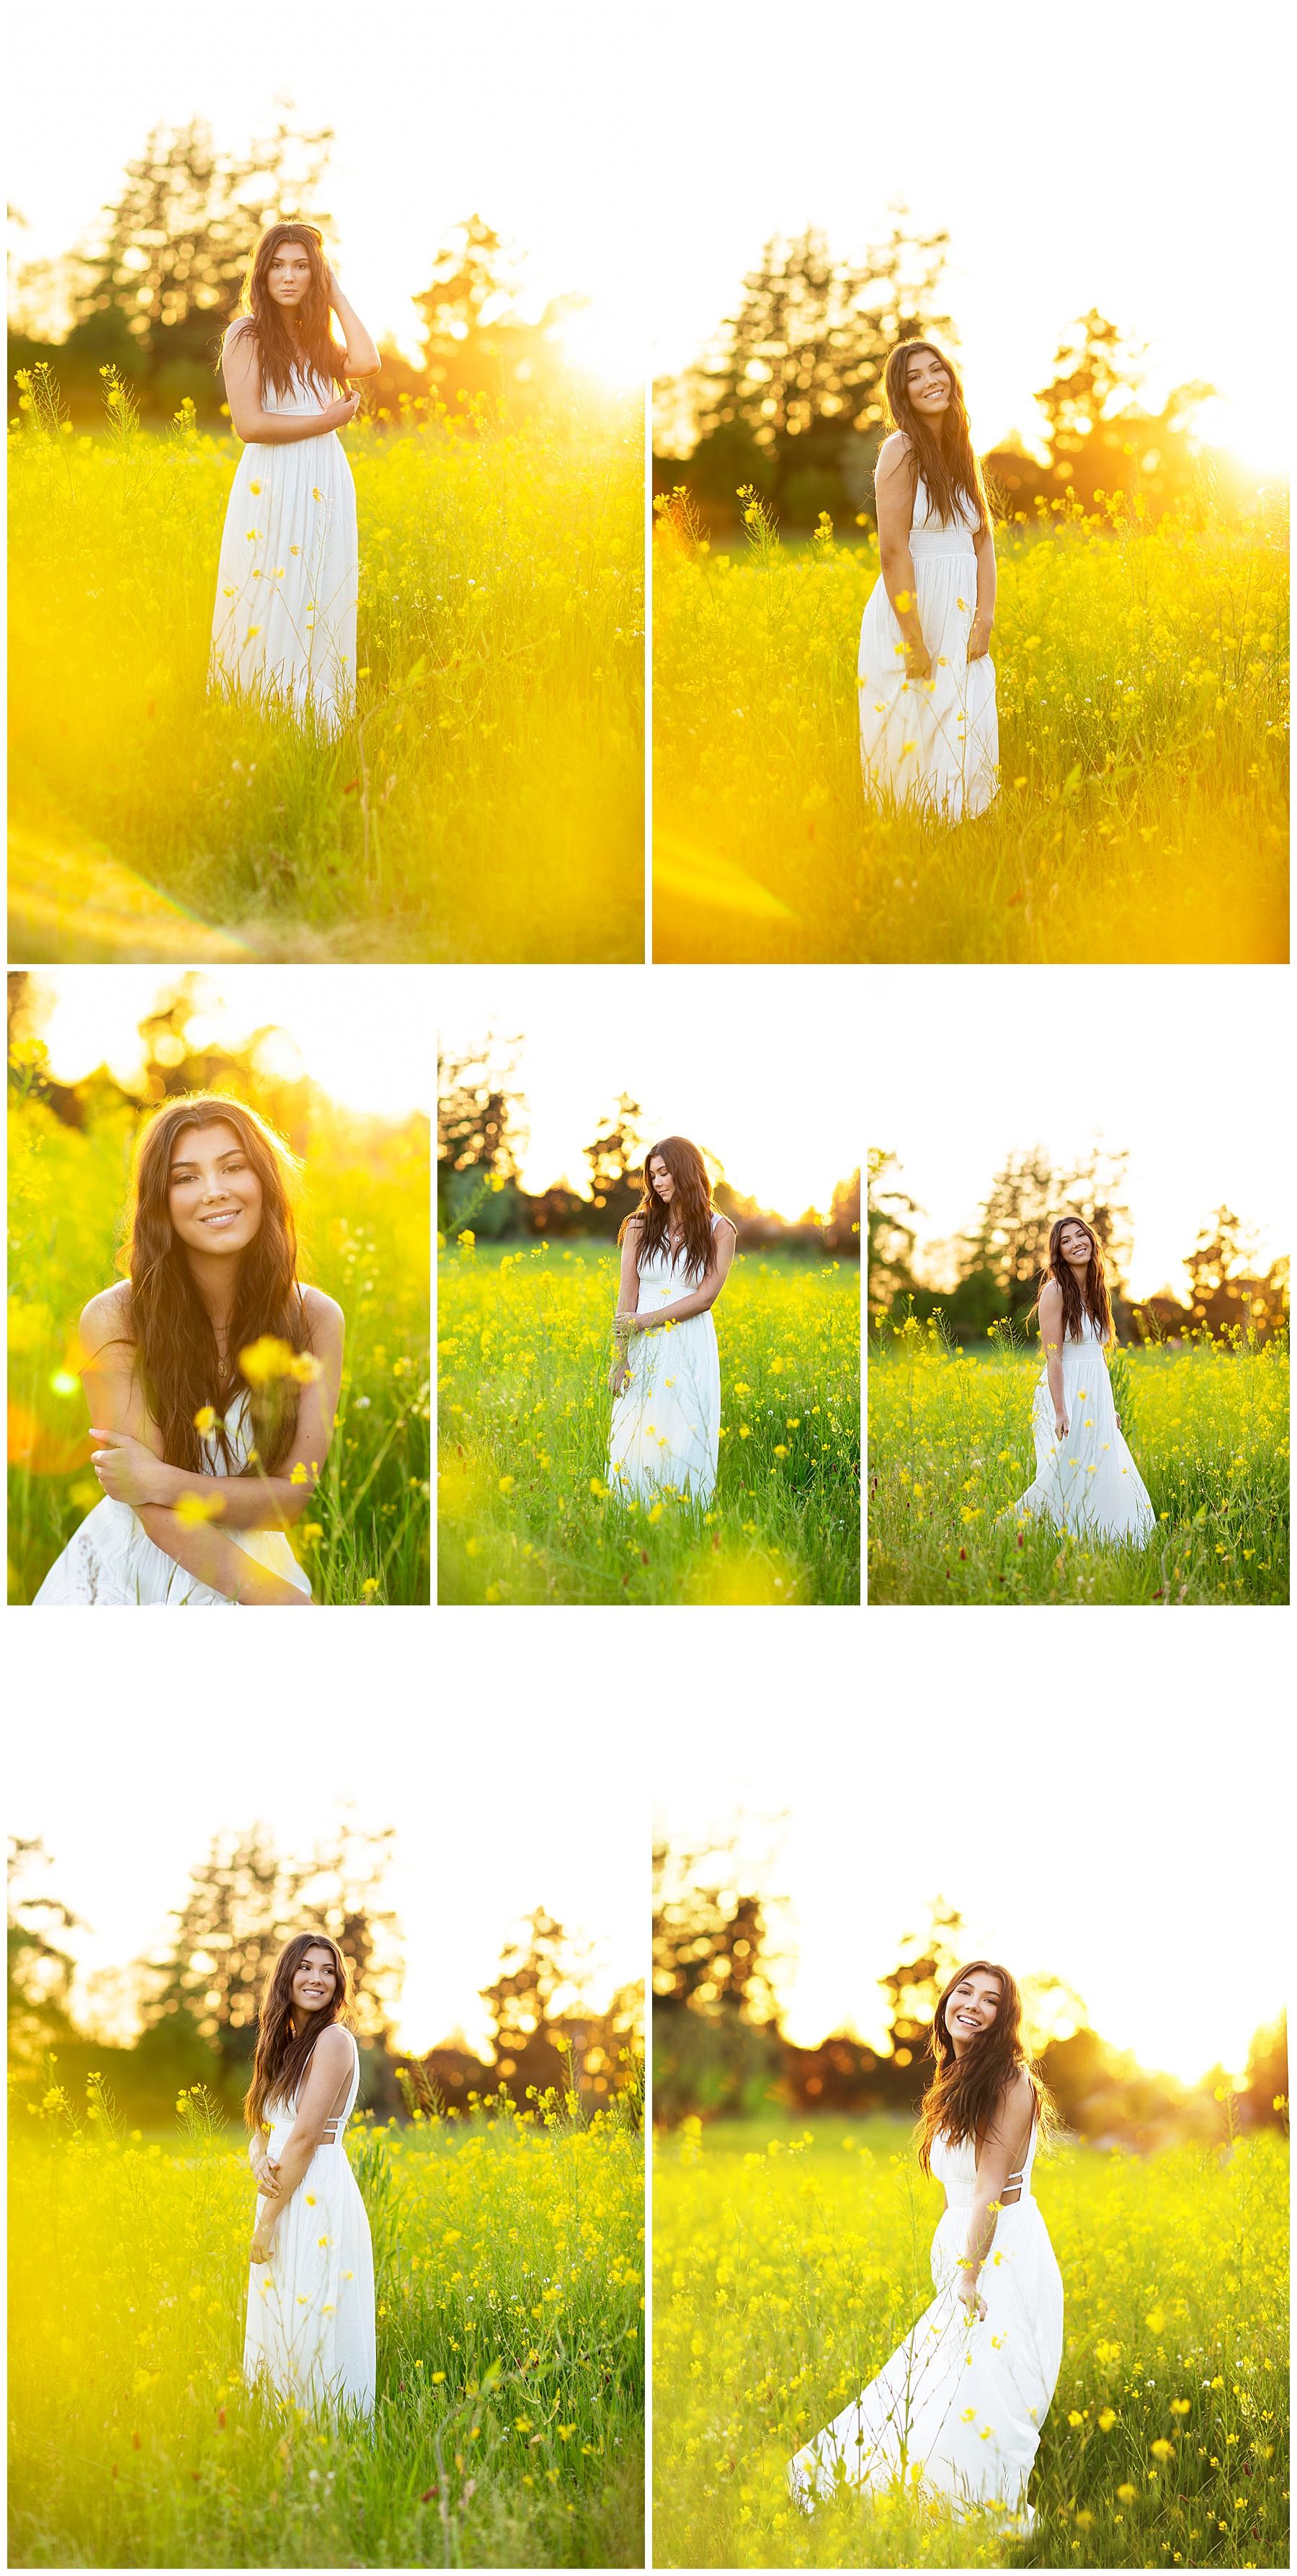 Brooke Portland Senior Pictures in 2019 Spring 6.jpg